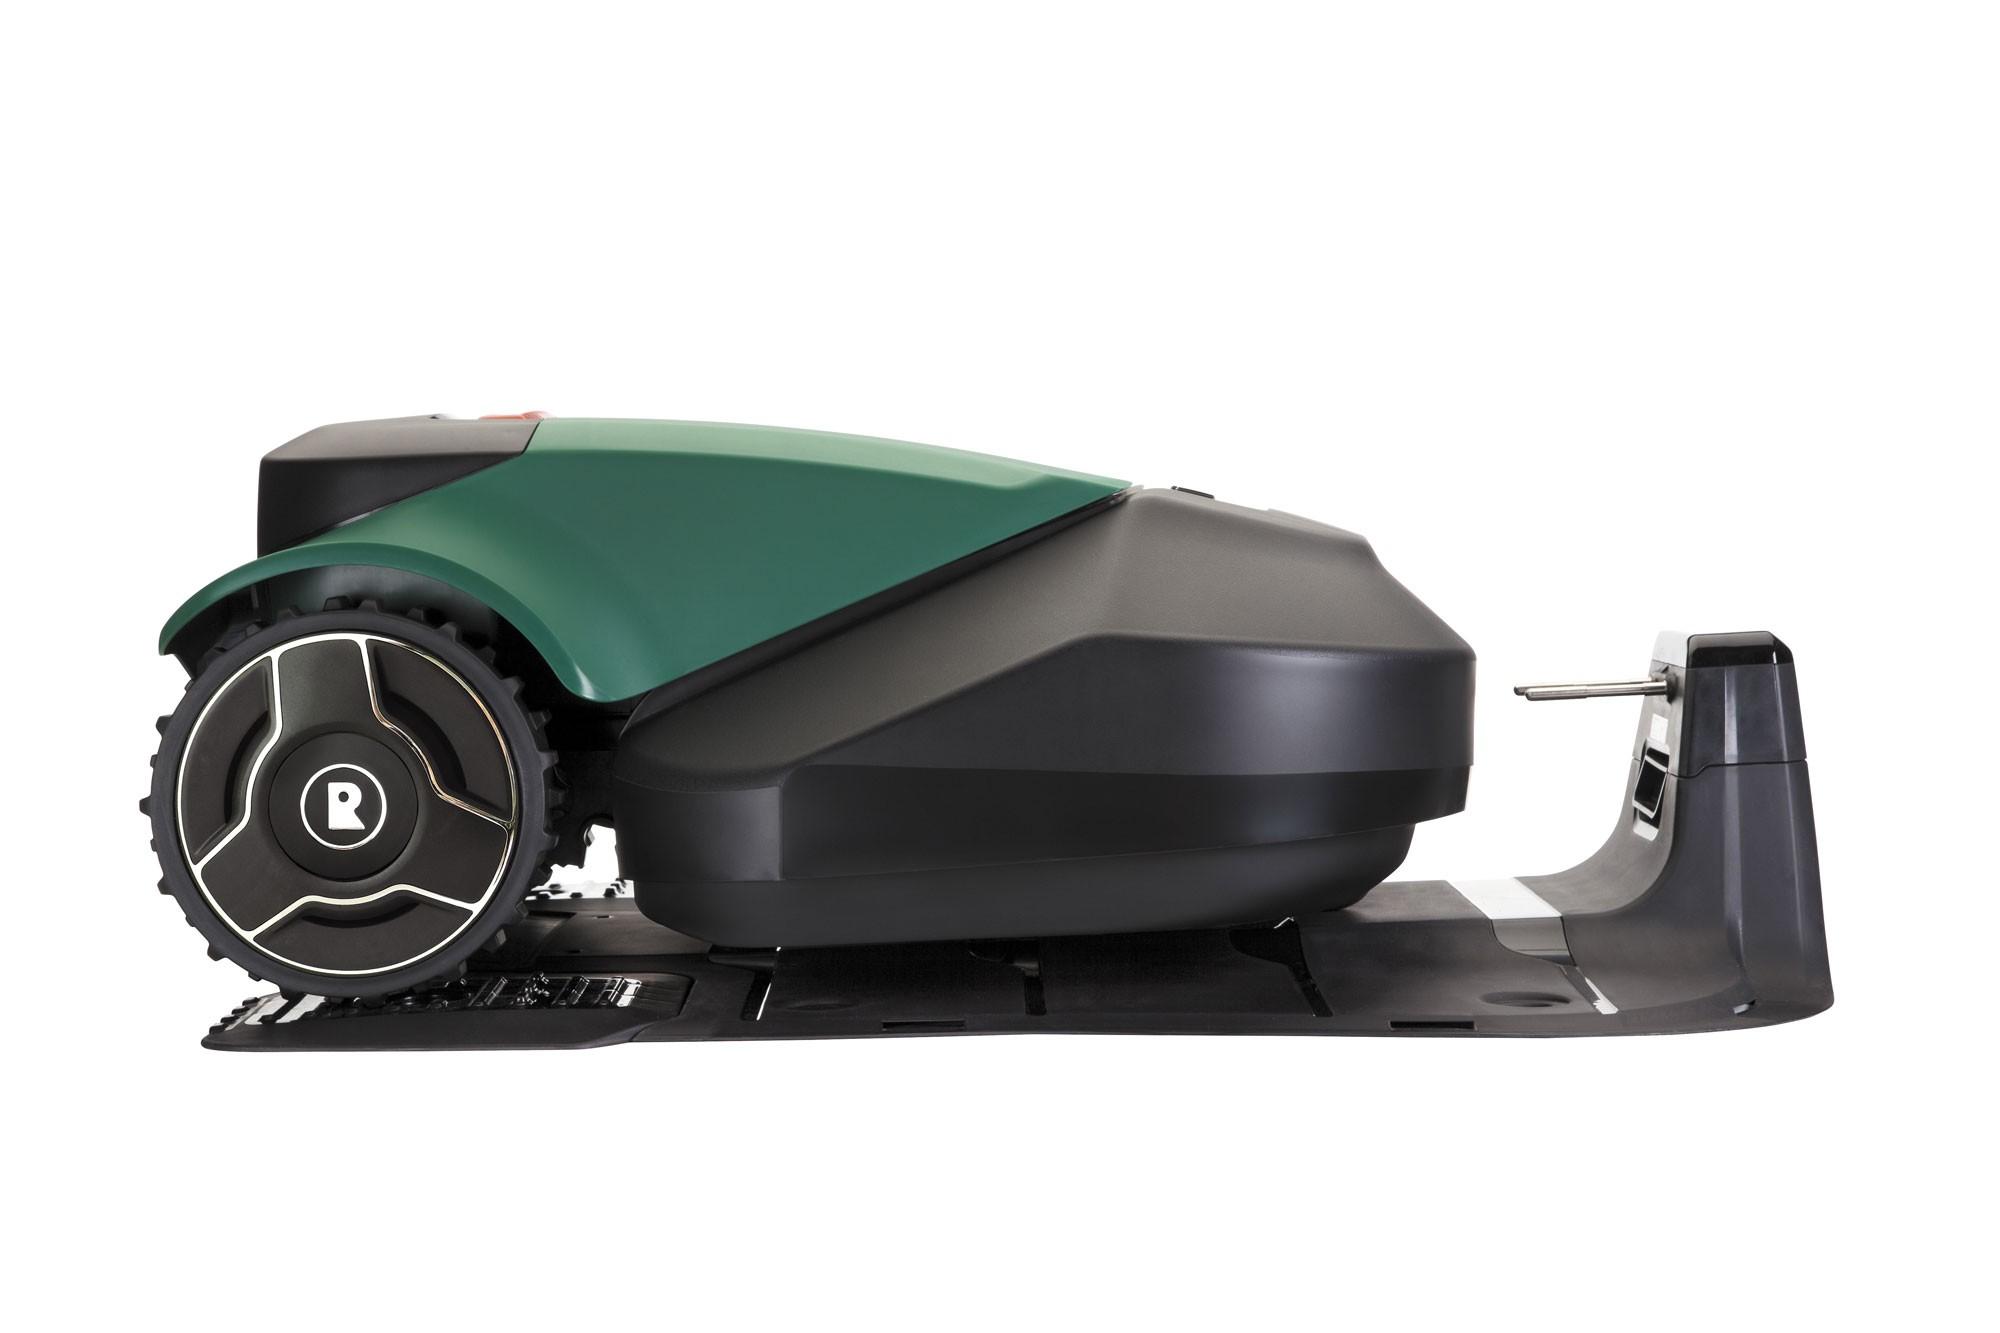 Robomow Mähroboter / Rasenroboter RS Royal 615u SB 56cm Bild 1